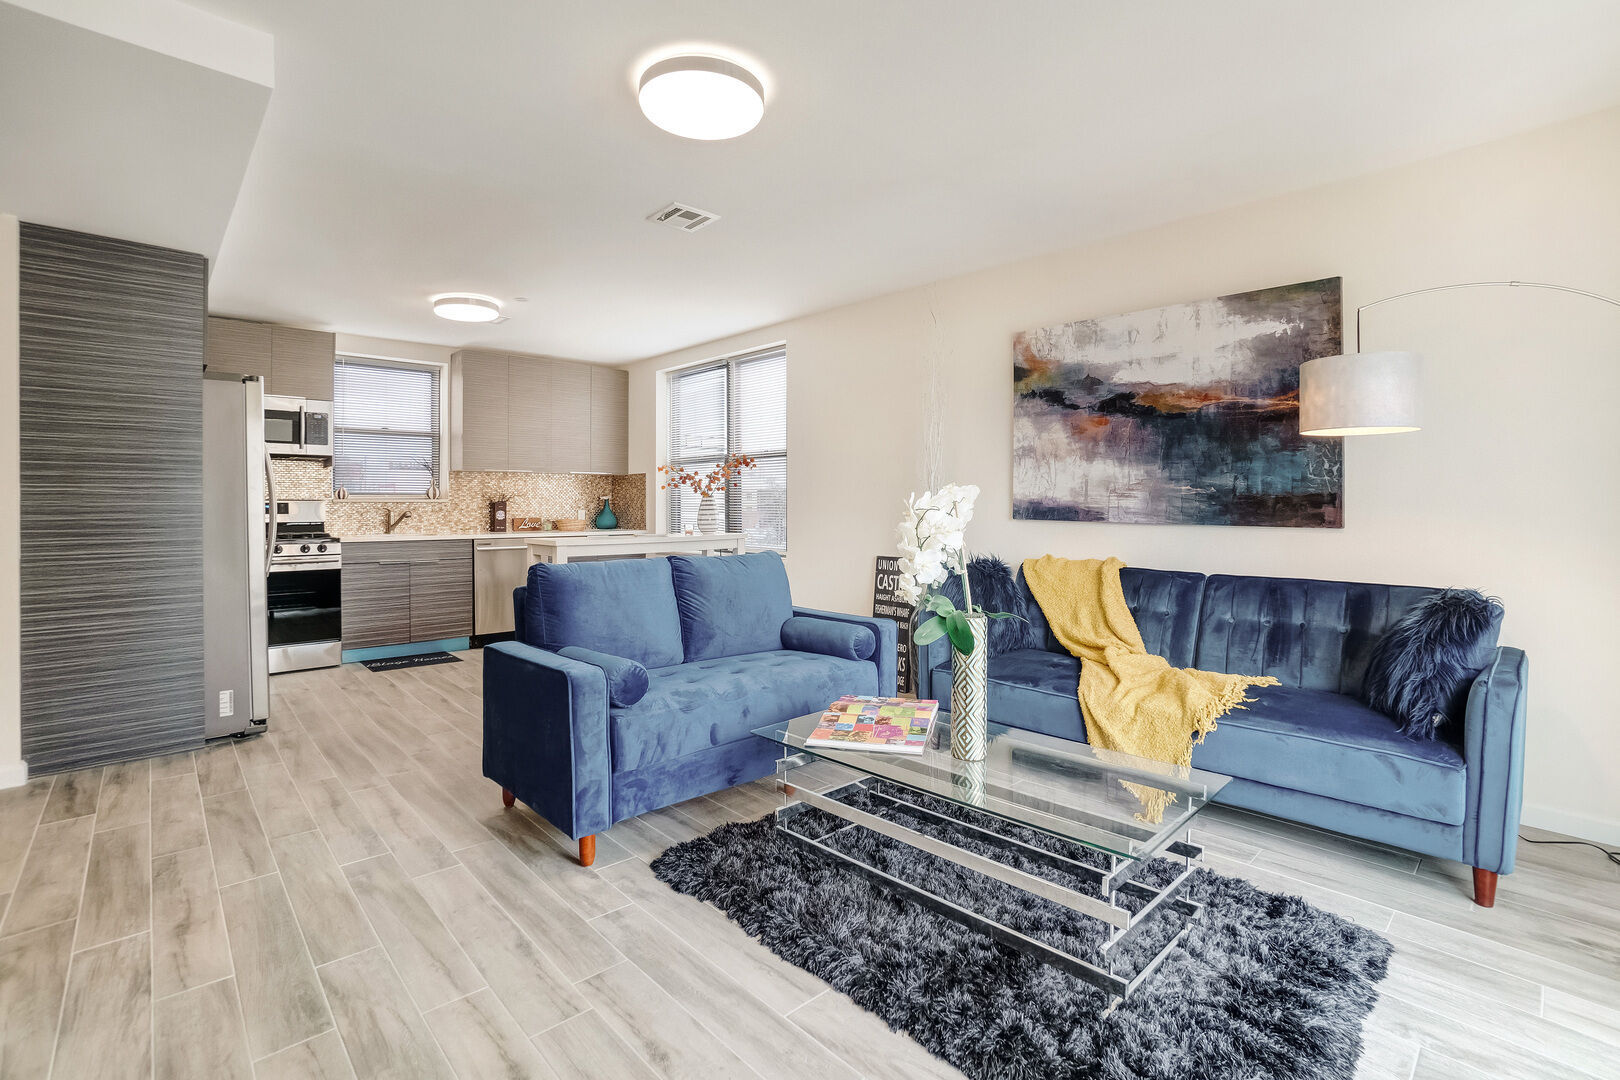 Apartment for sale at 407 Ocean View Avenue, Apt 4